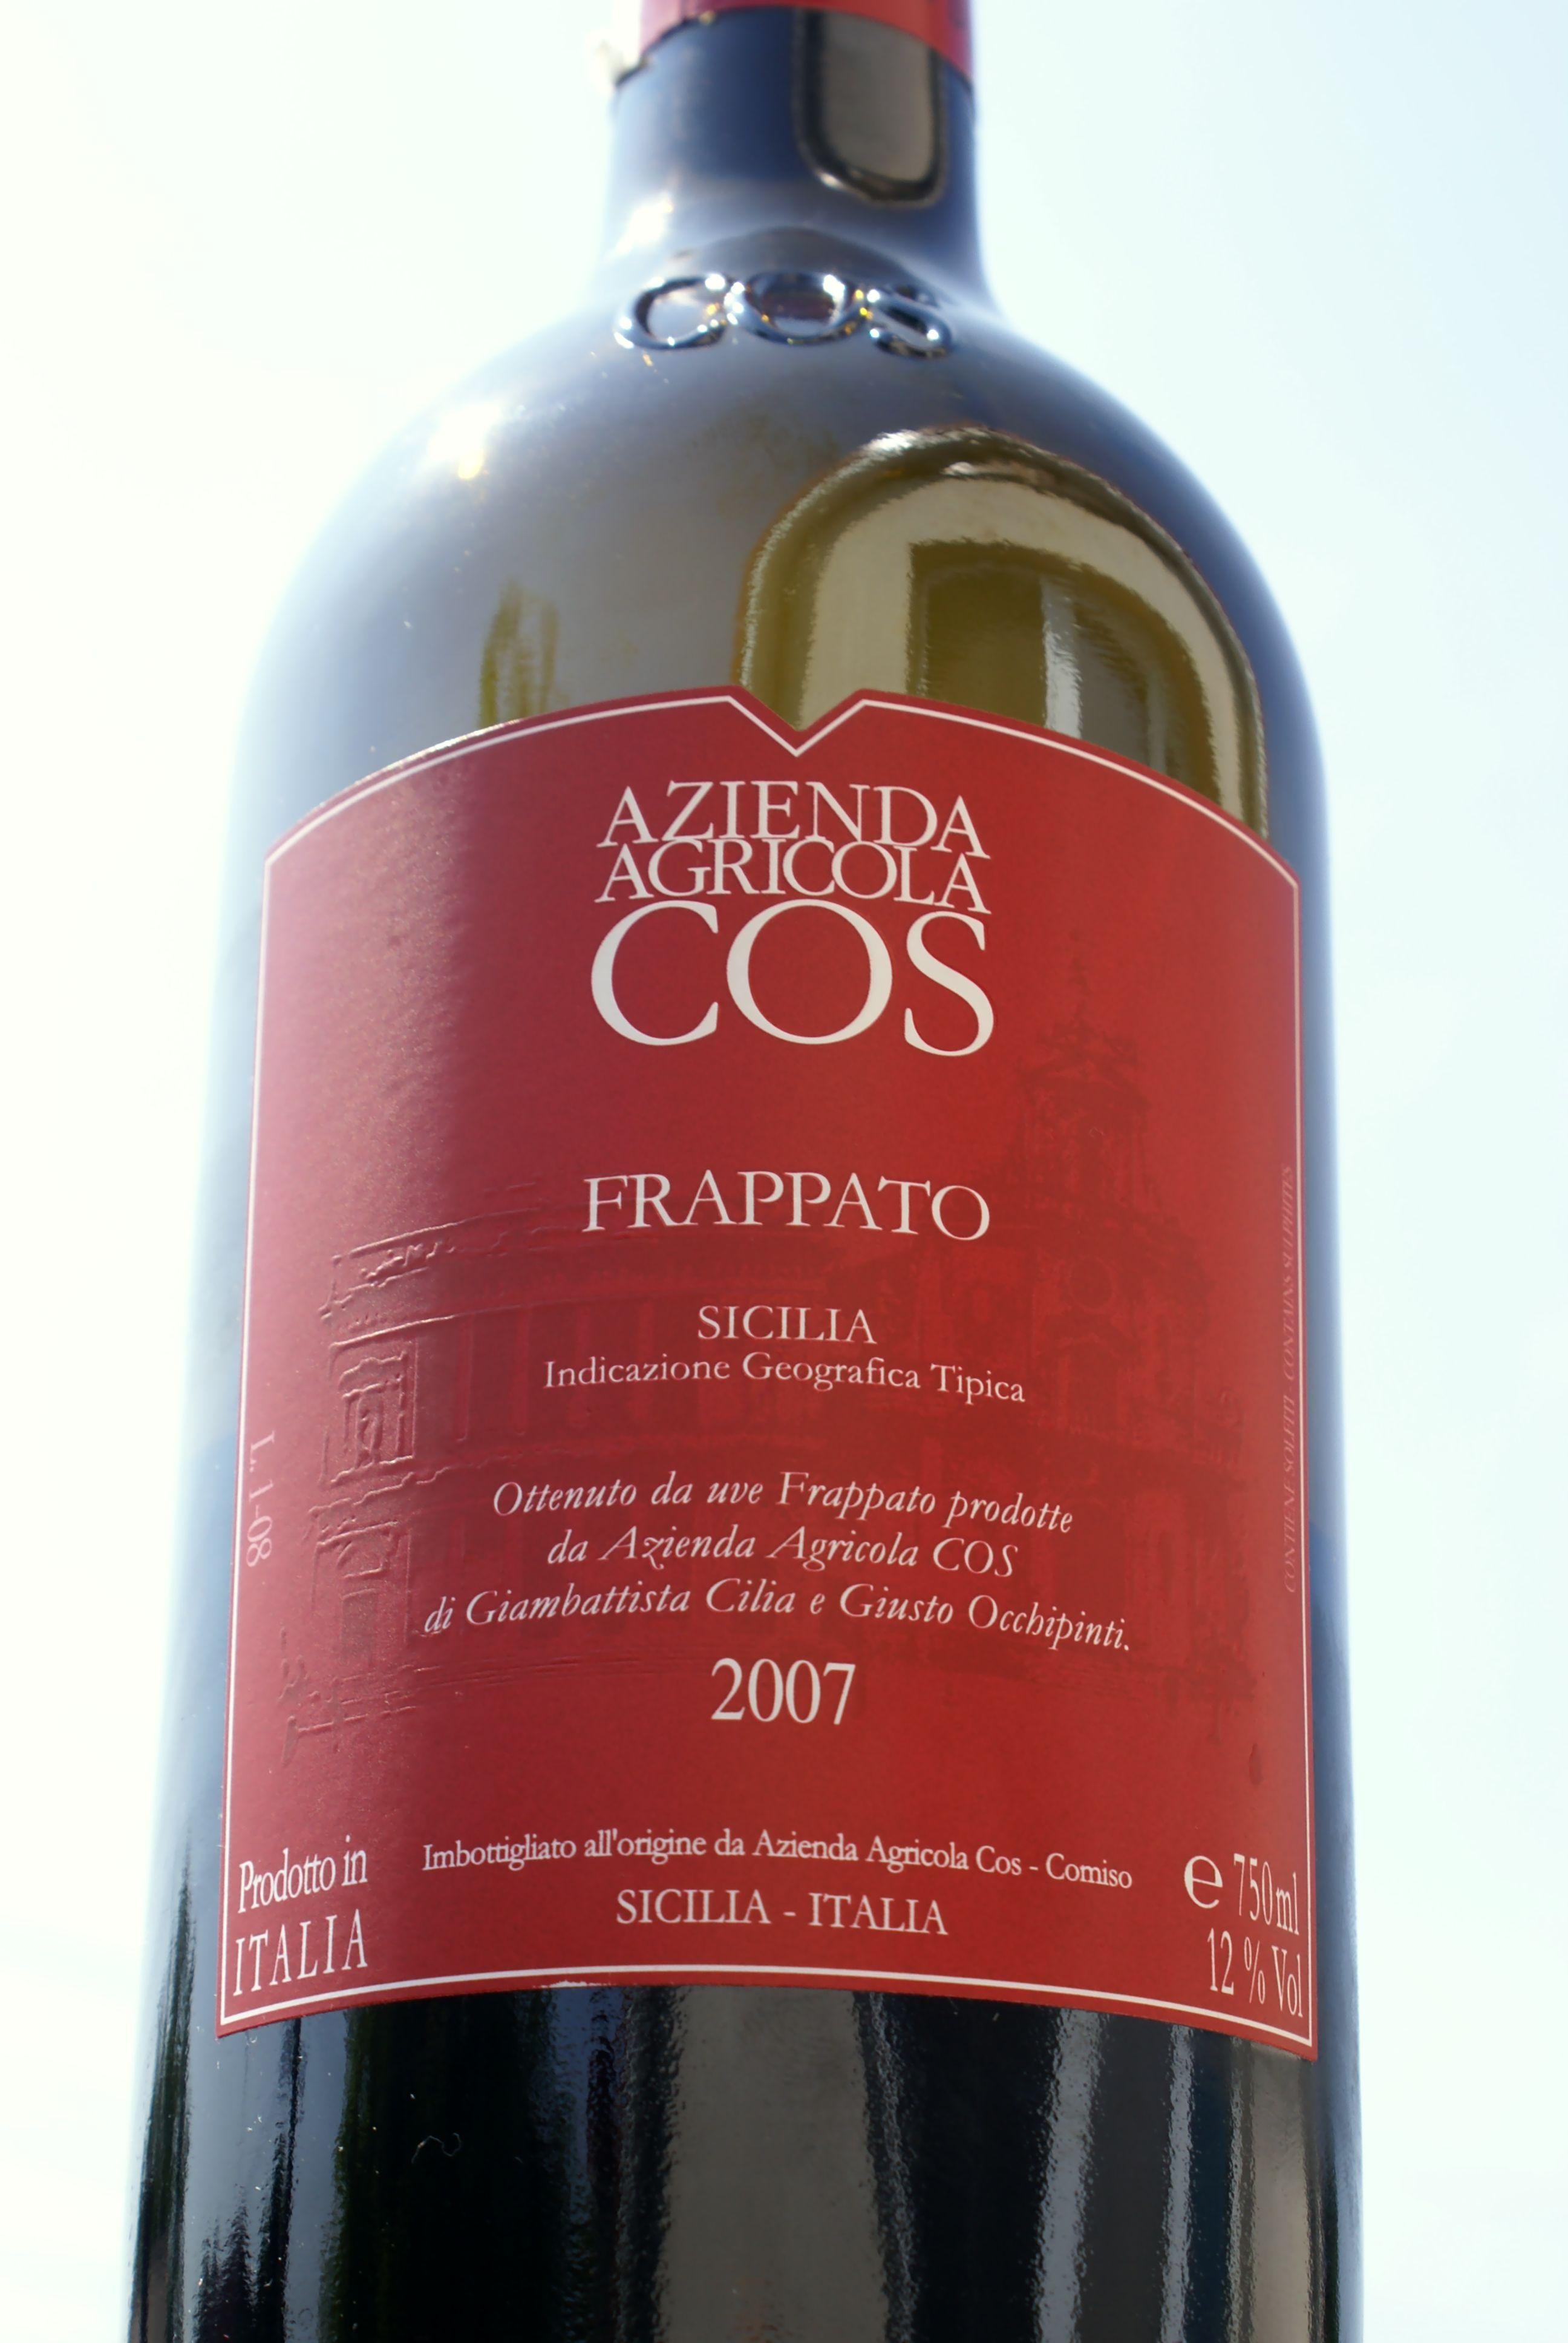 COS Frappato 2007